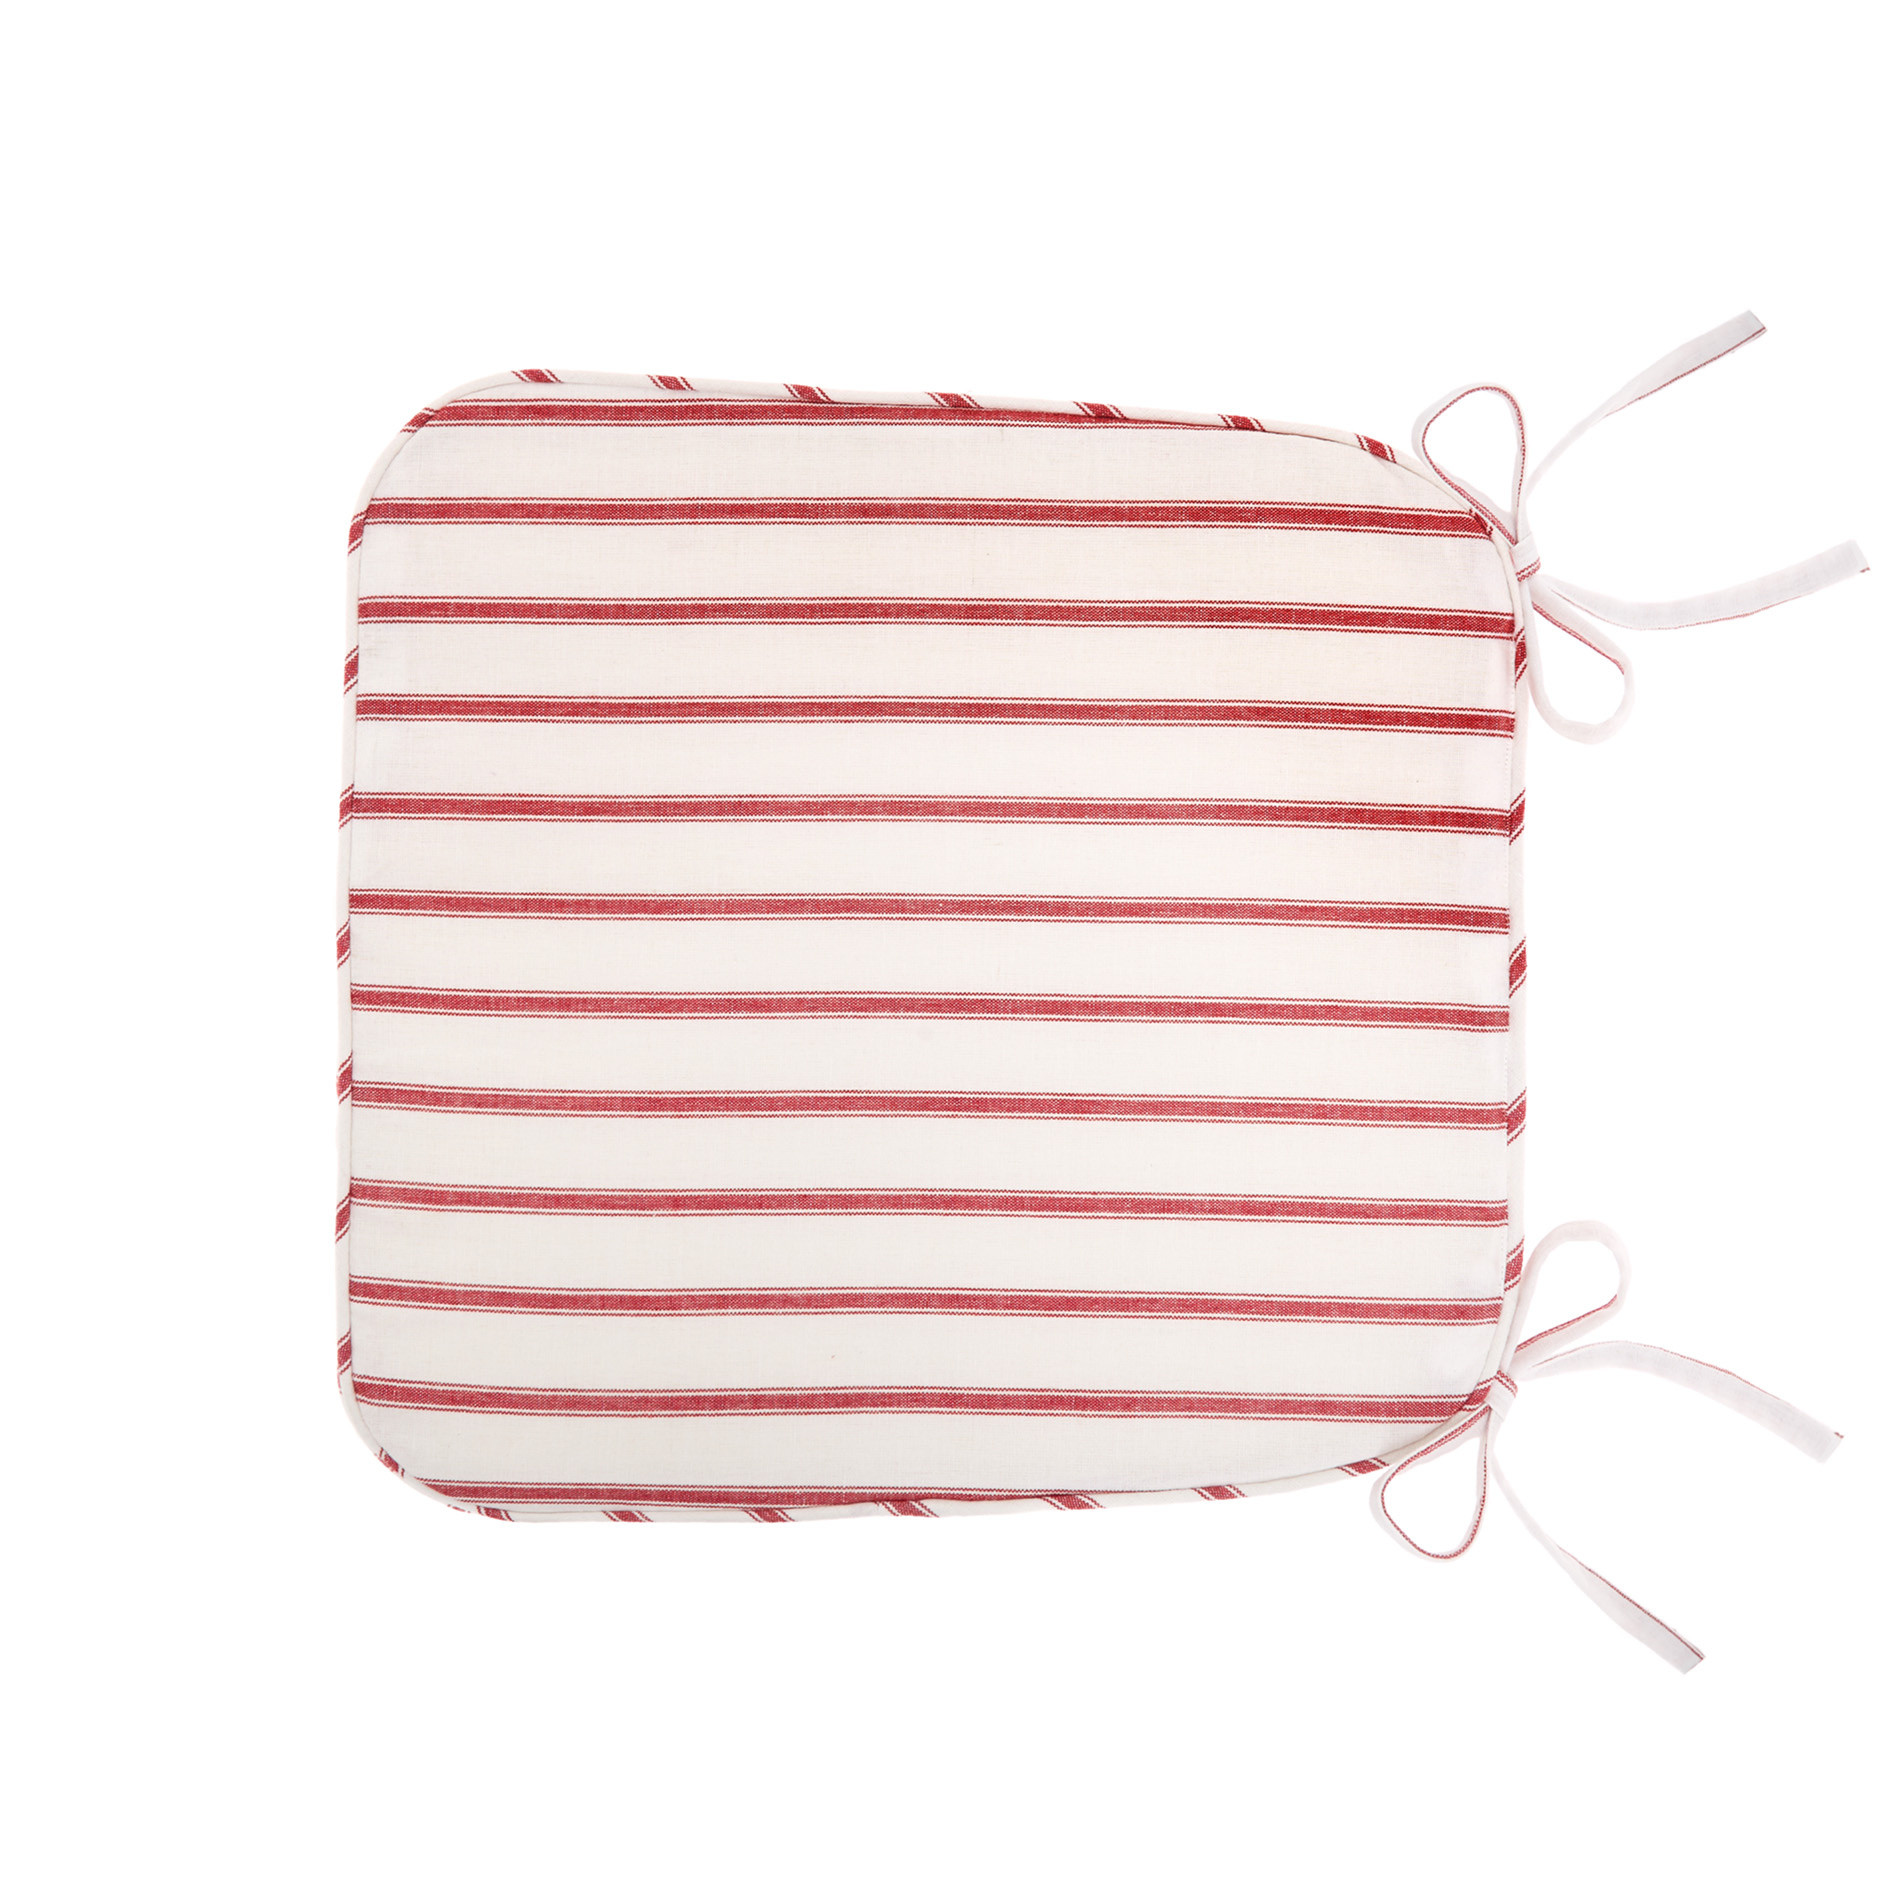 Cuscino da cucina puro cotone a righe, Rosso, large image number 0